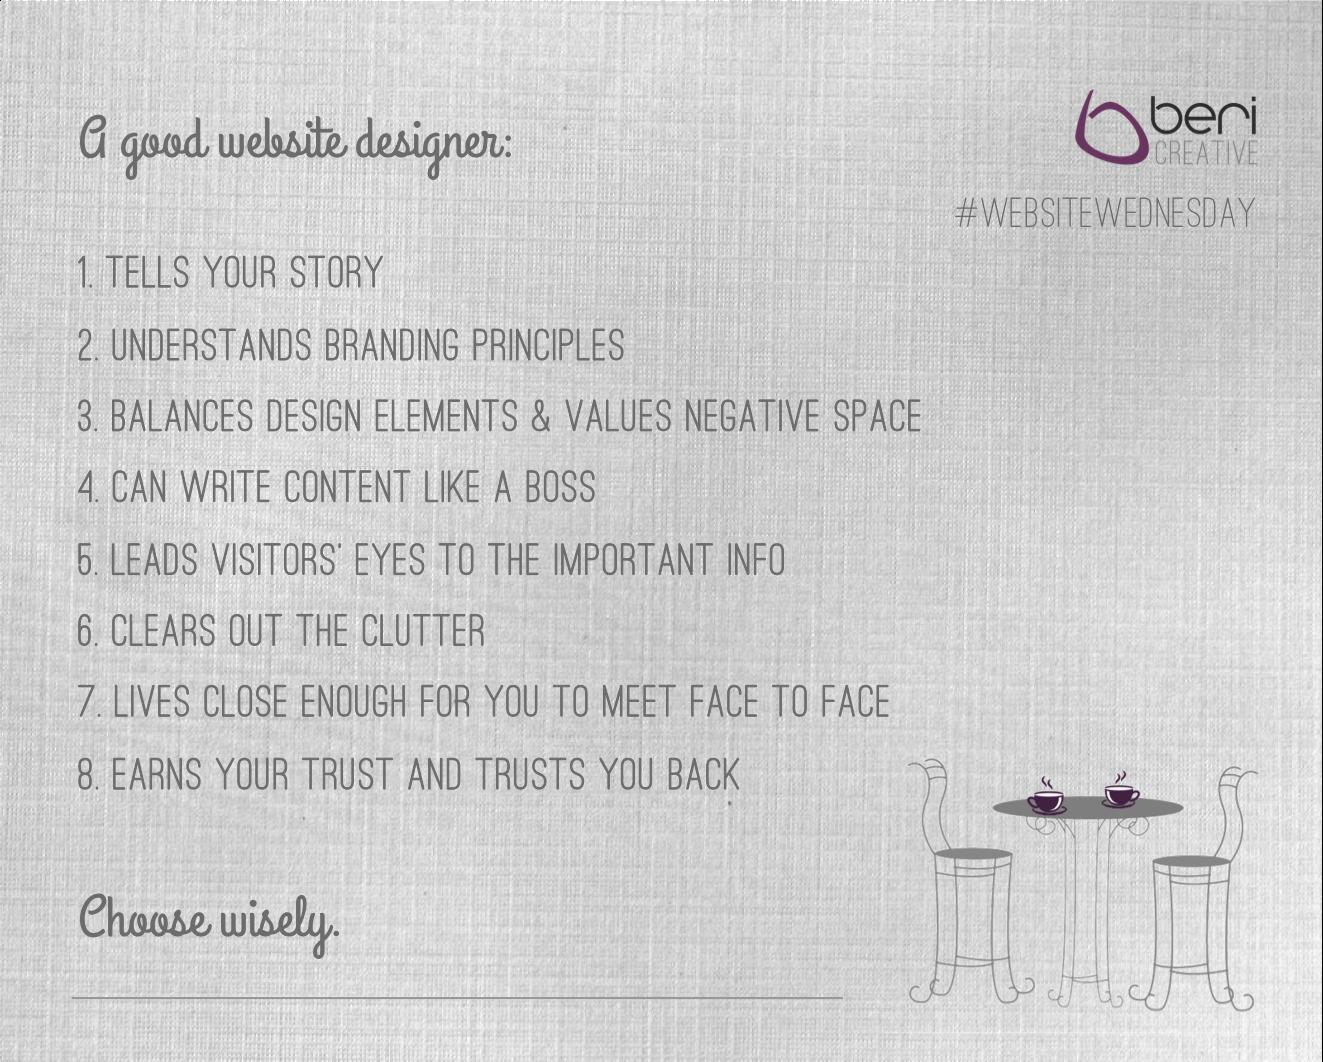 PLEASE read this blog before choosing your website designer - it's REALLY important! #WebsiteWednesday @BeriCreative http://bericreative.com/websitewednesday-5/